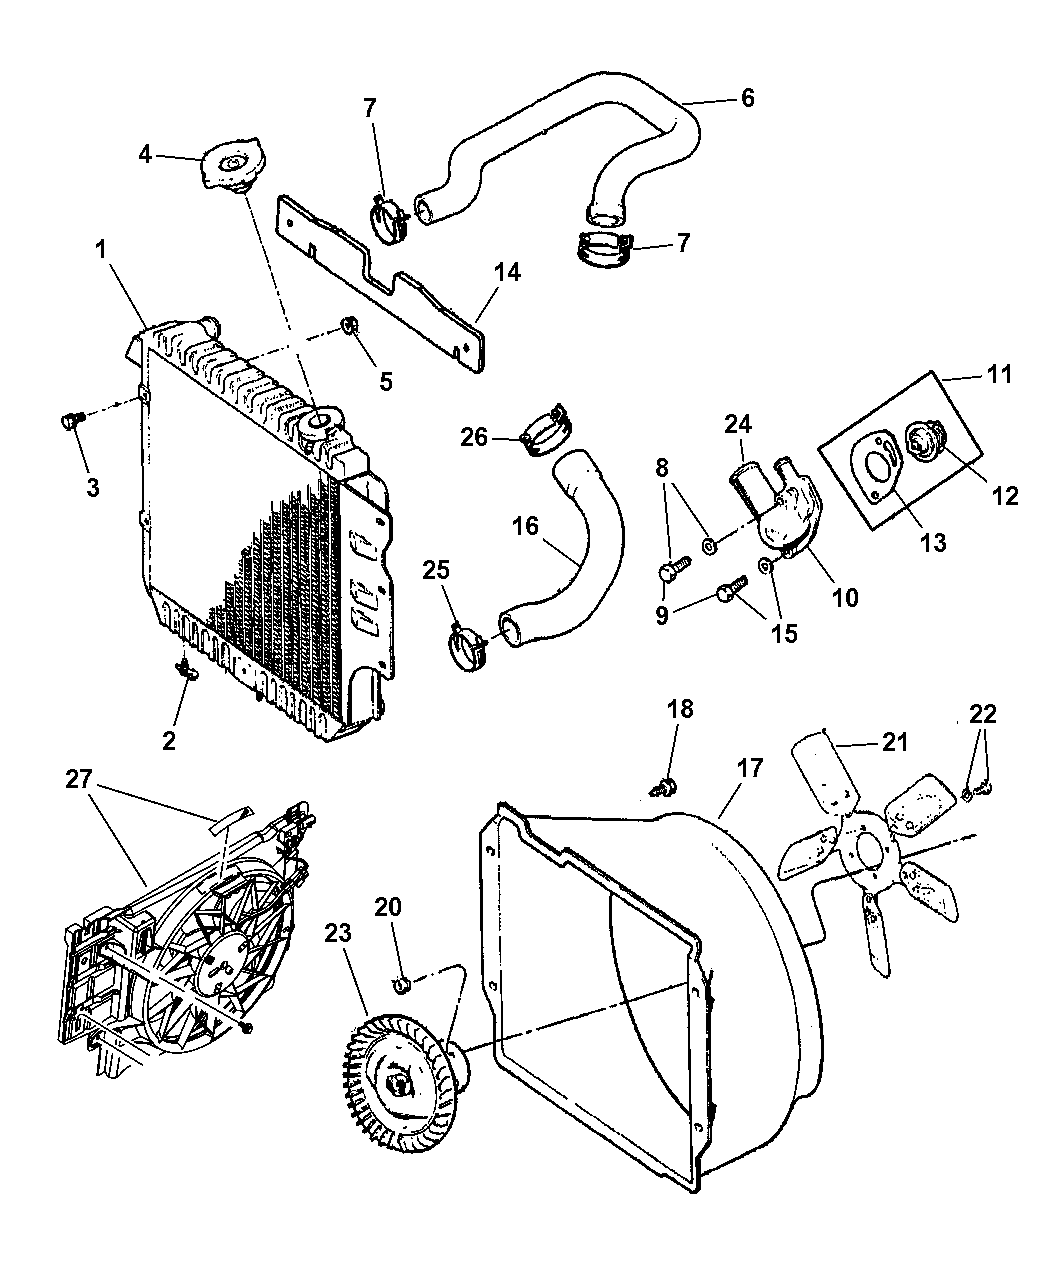 2006 Jeep Wrangler Parts Diagram